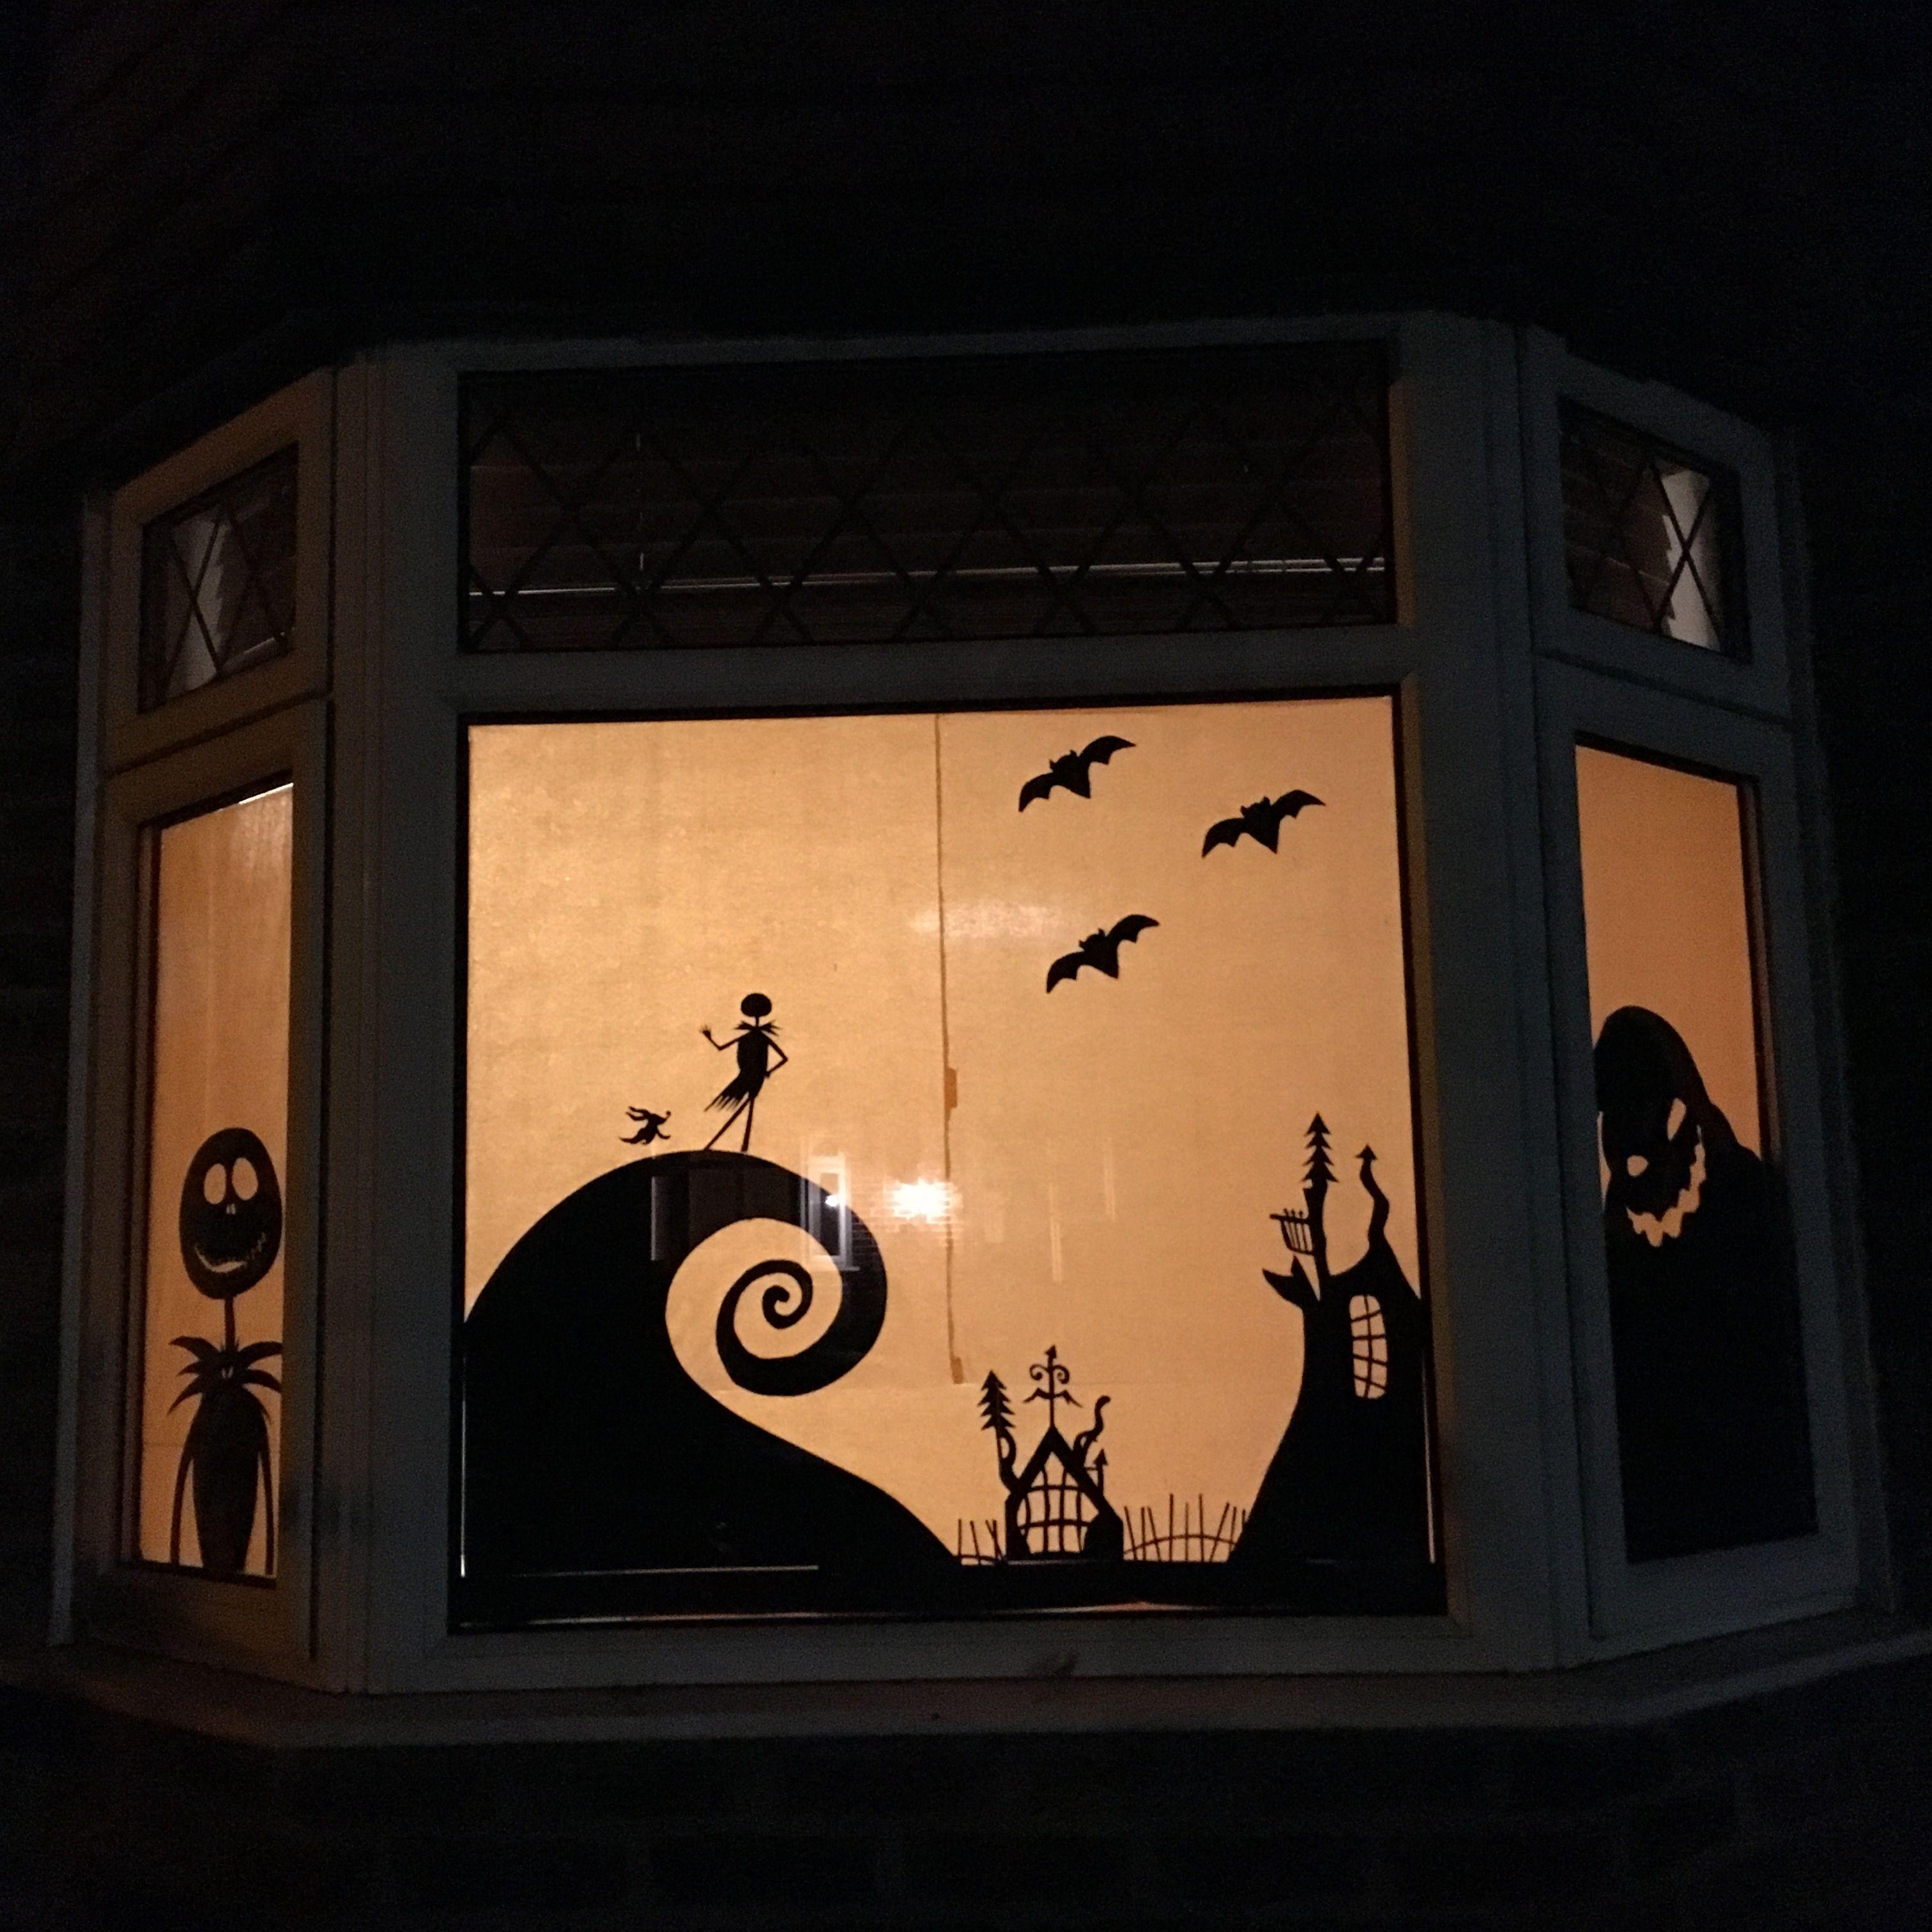 Halloween window decoration. Nightmare before Christmas